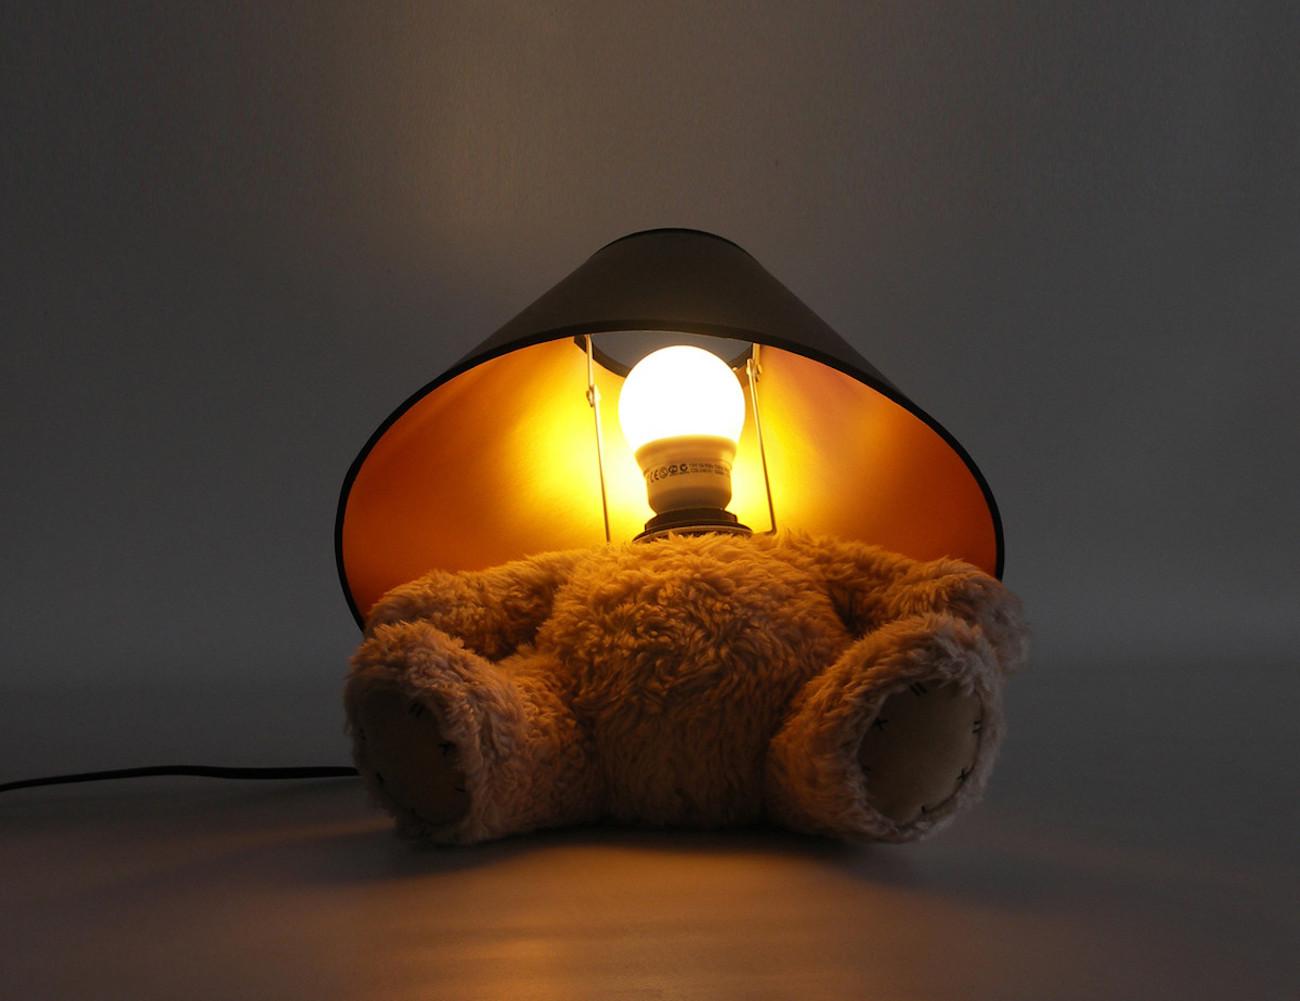 teddy-bear-lamp-from-suck-uk-new-04